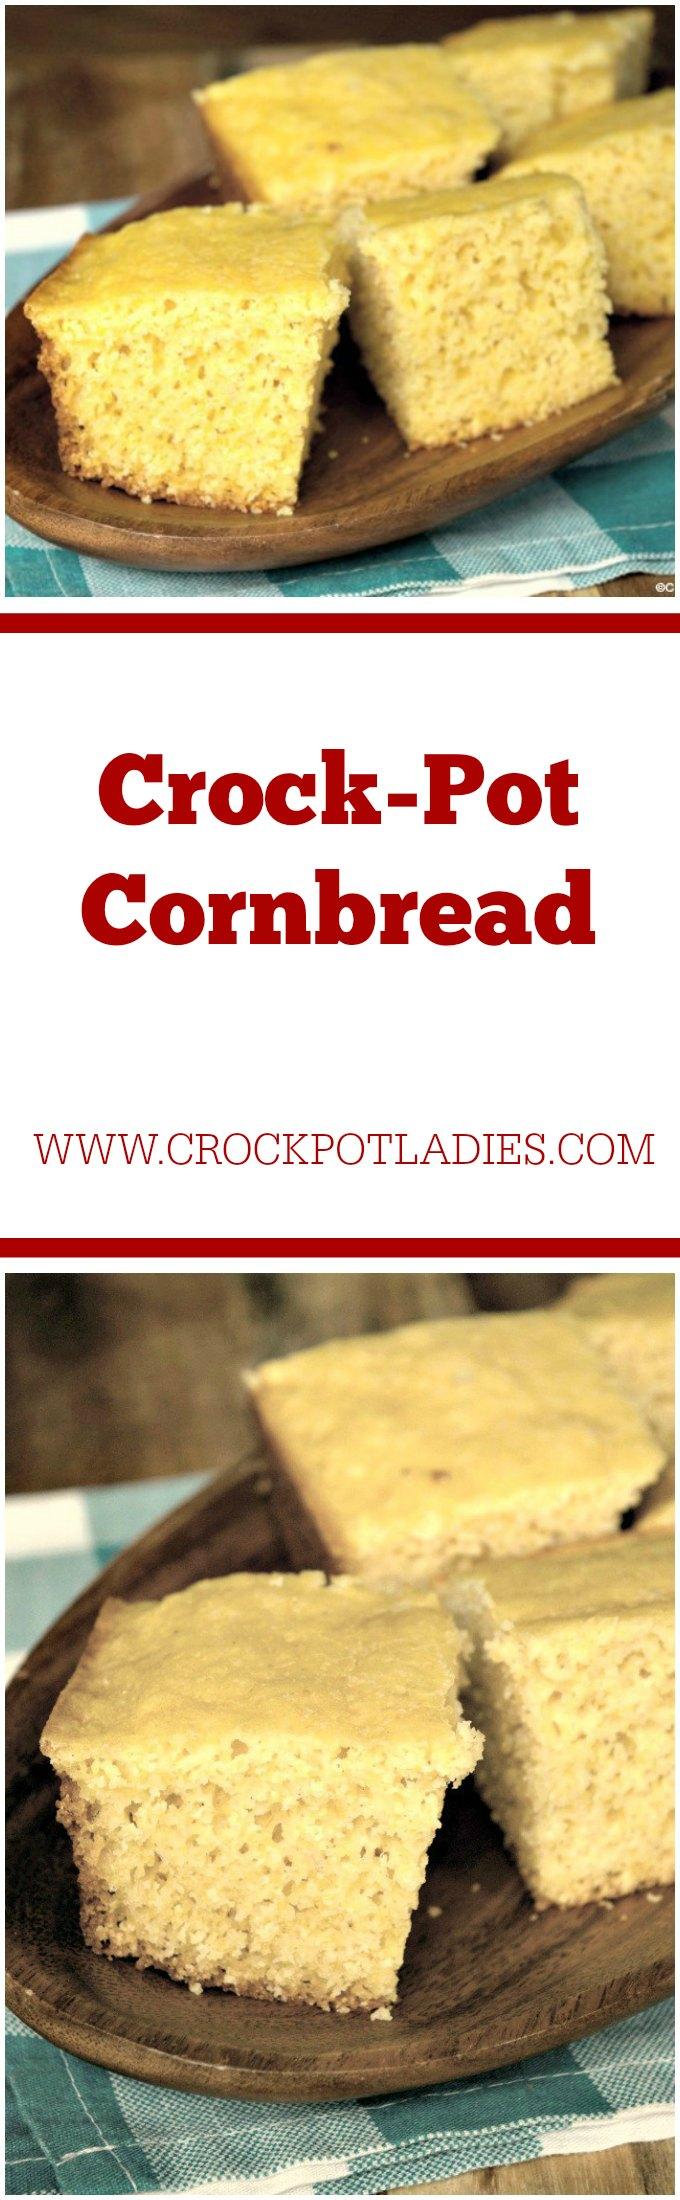 Crock-Pot Cornbread